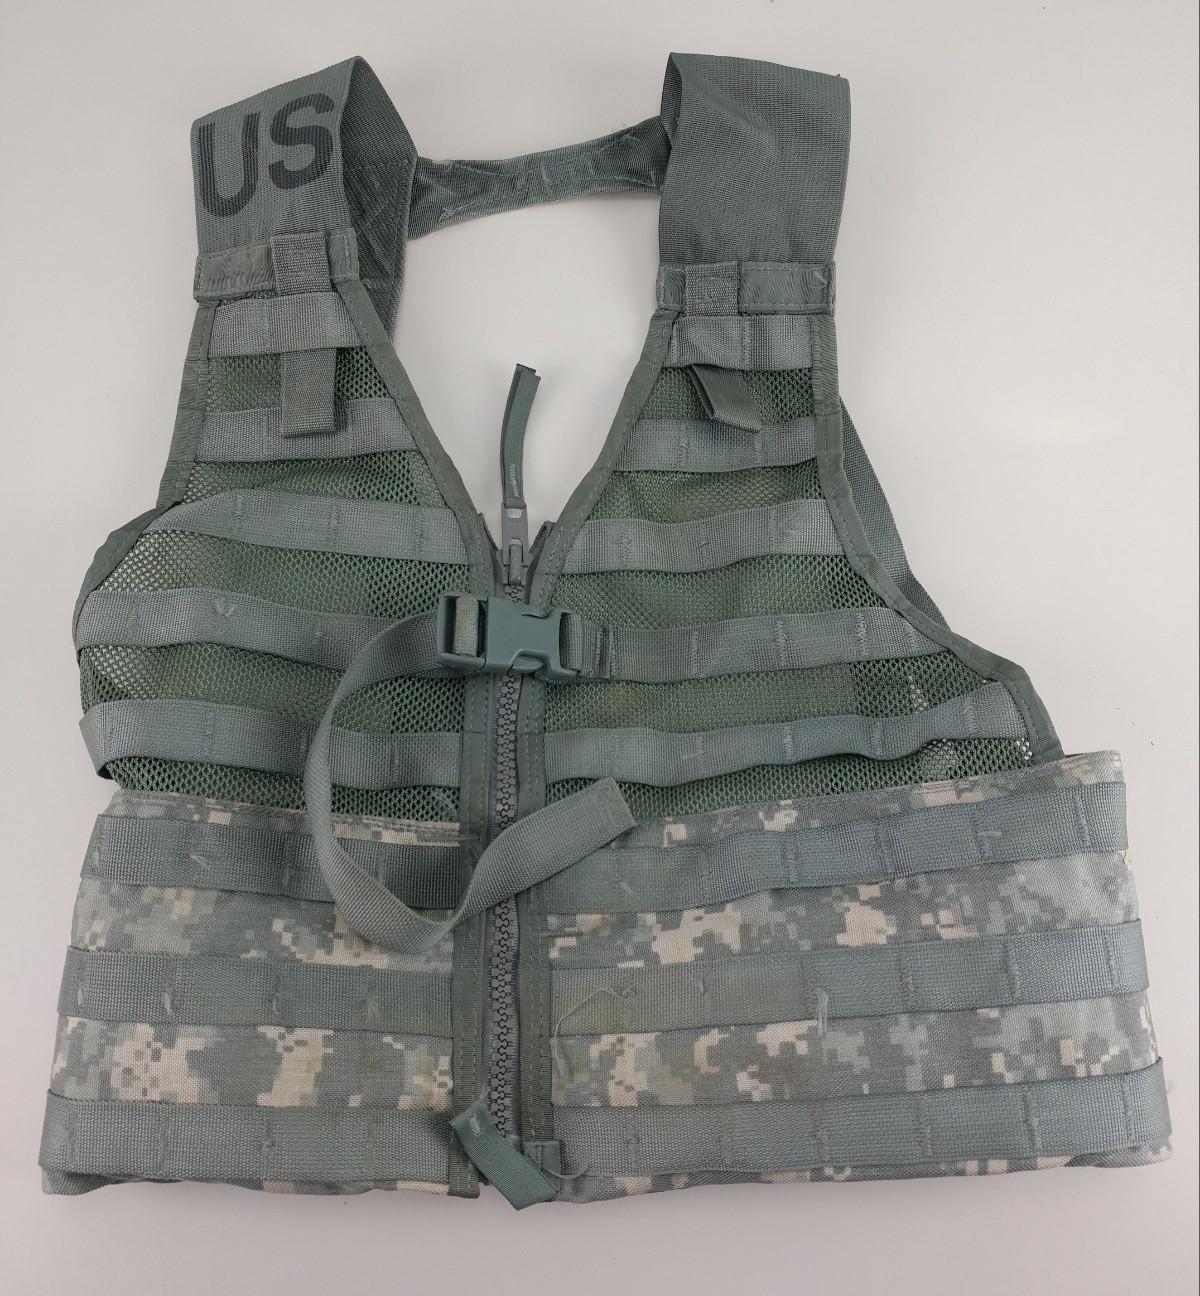 MOLLE II ACU Fighting Load Carrier Tactial Vest FLC Digital Camo